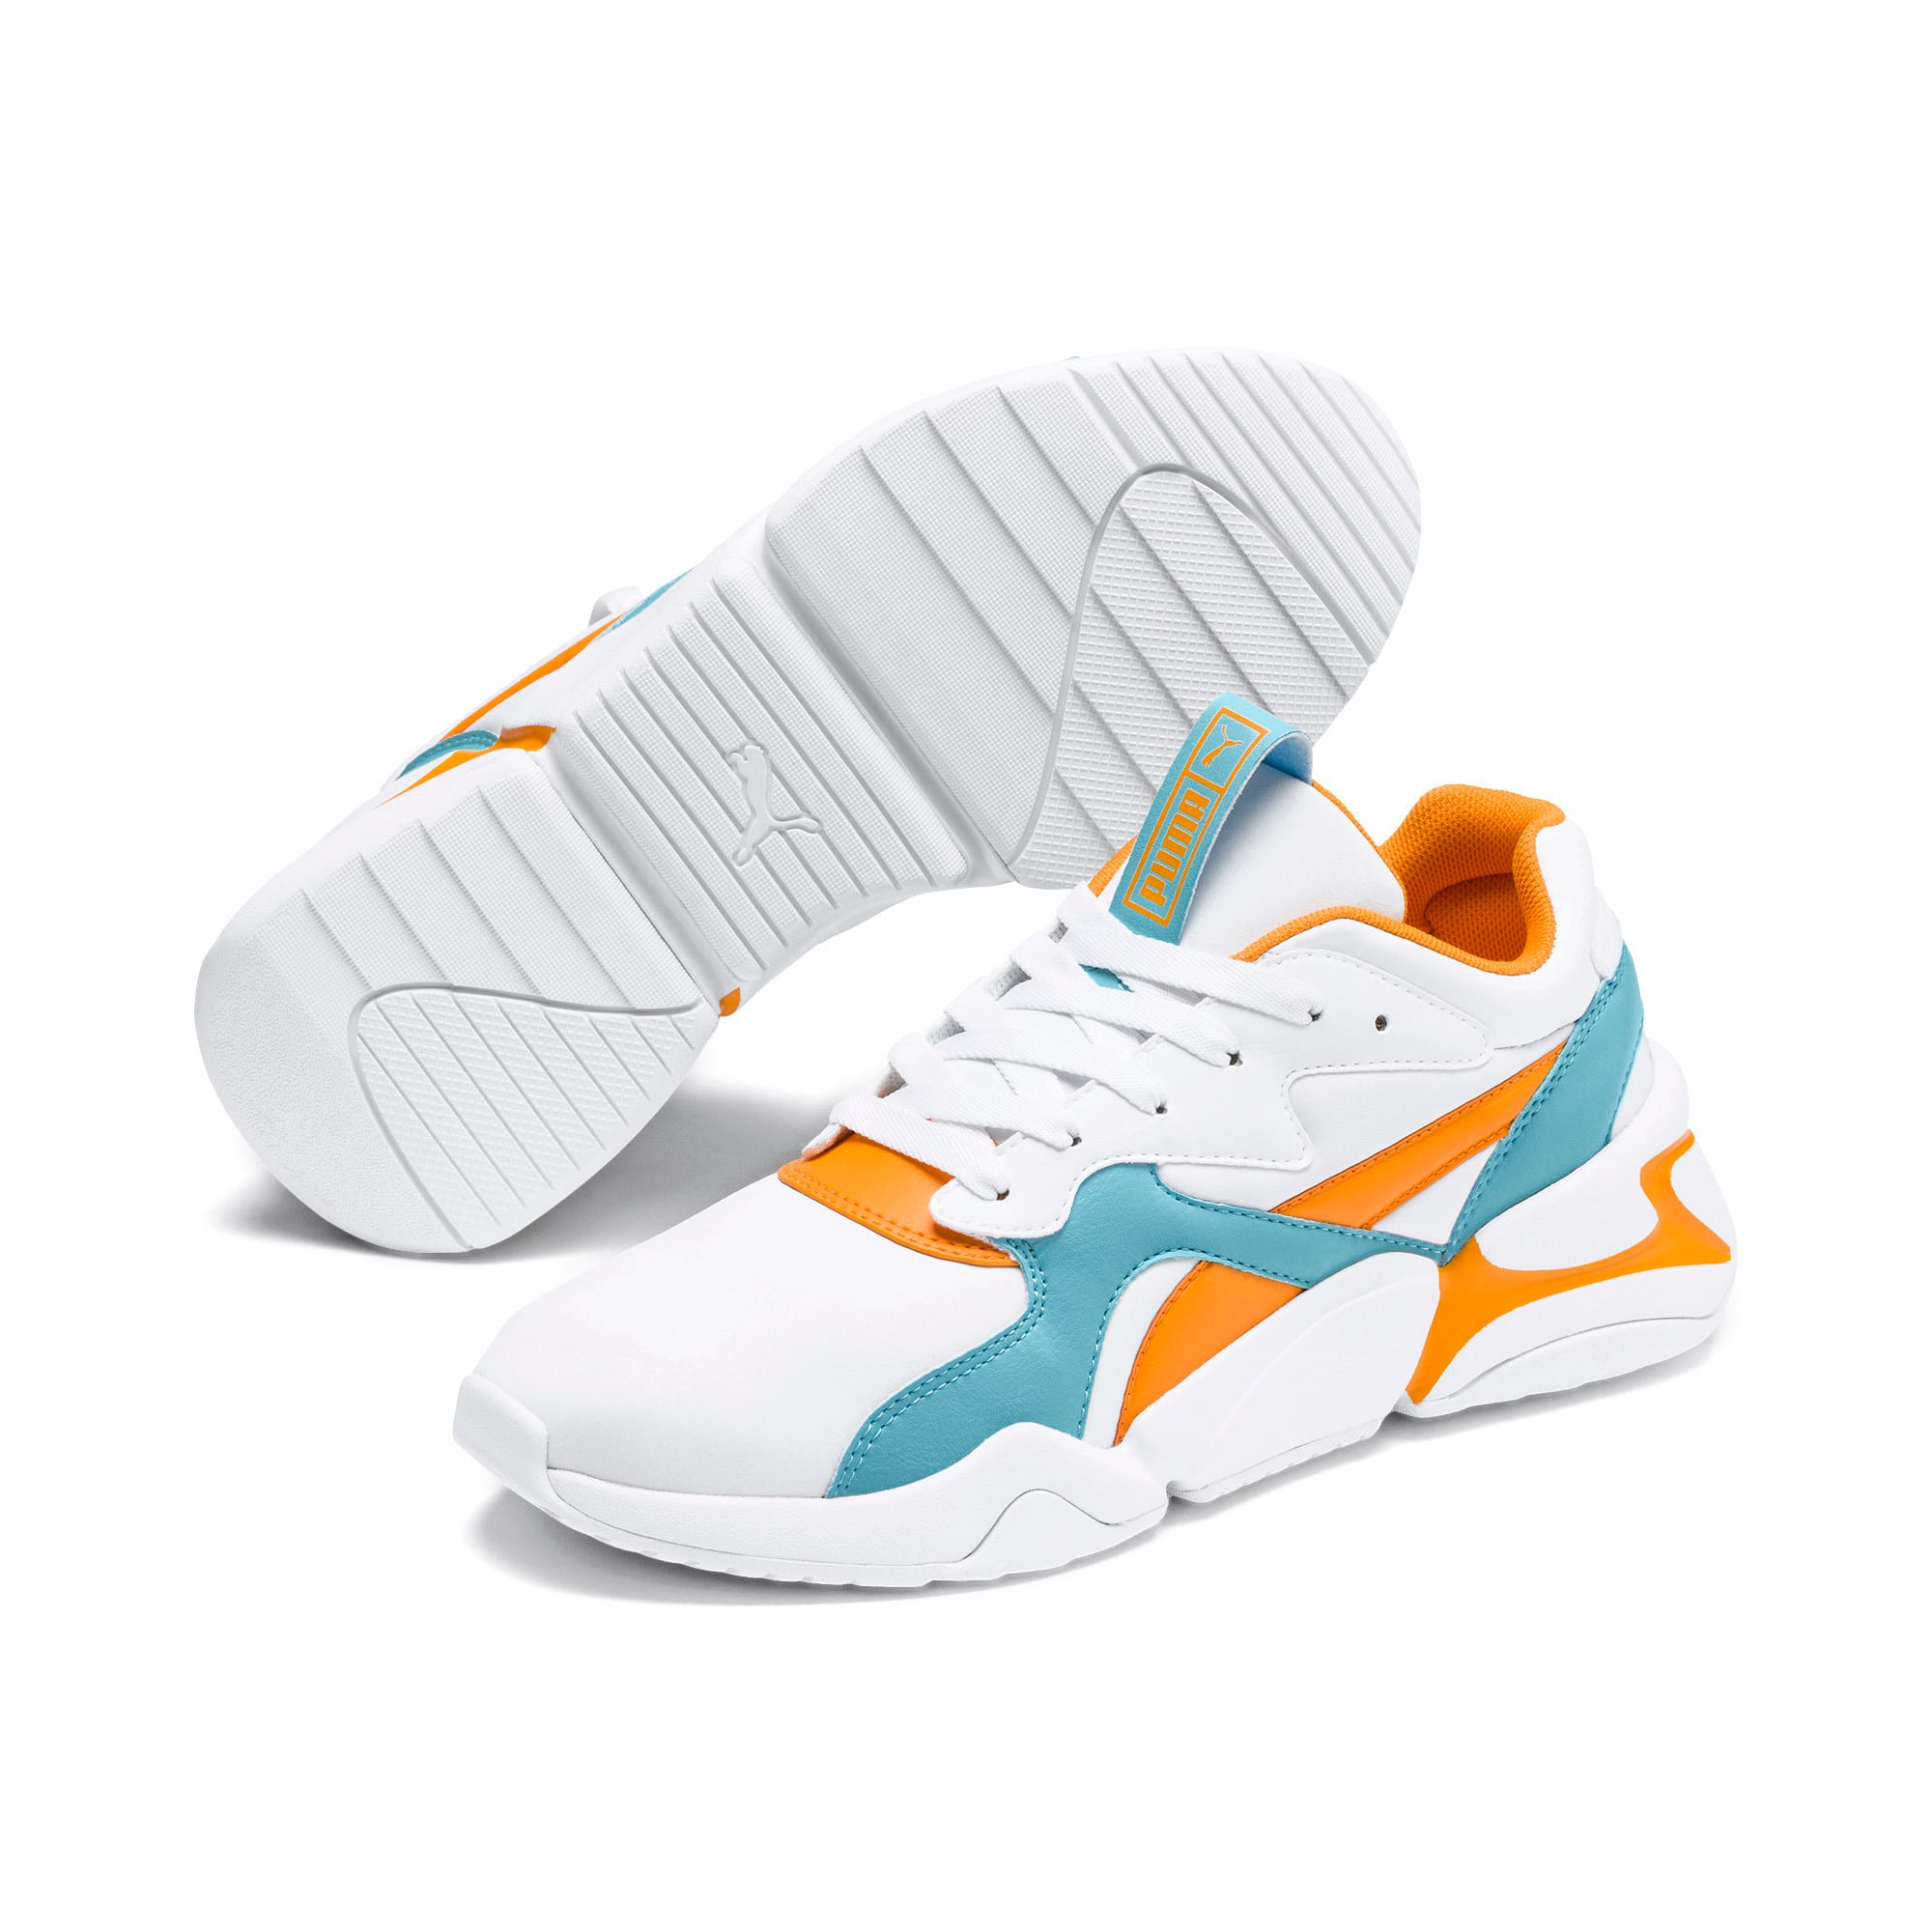 Thumbnail 3 of Nova Women's Sneakers, Puma White-Milky Blue, medium